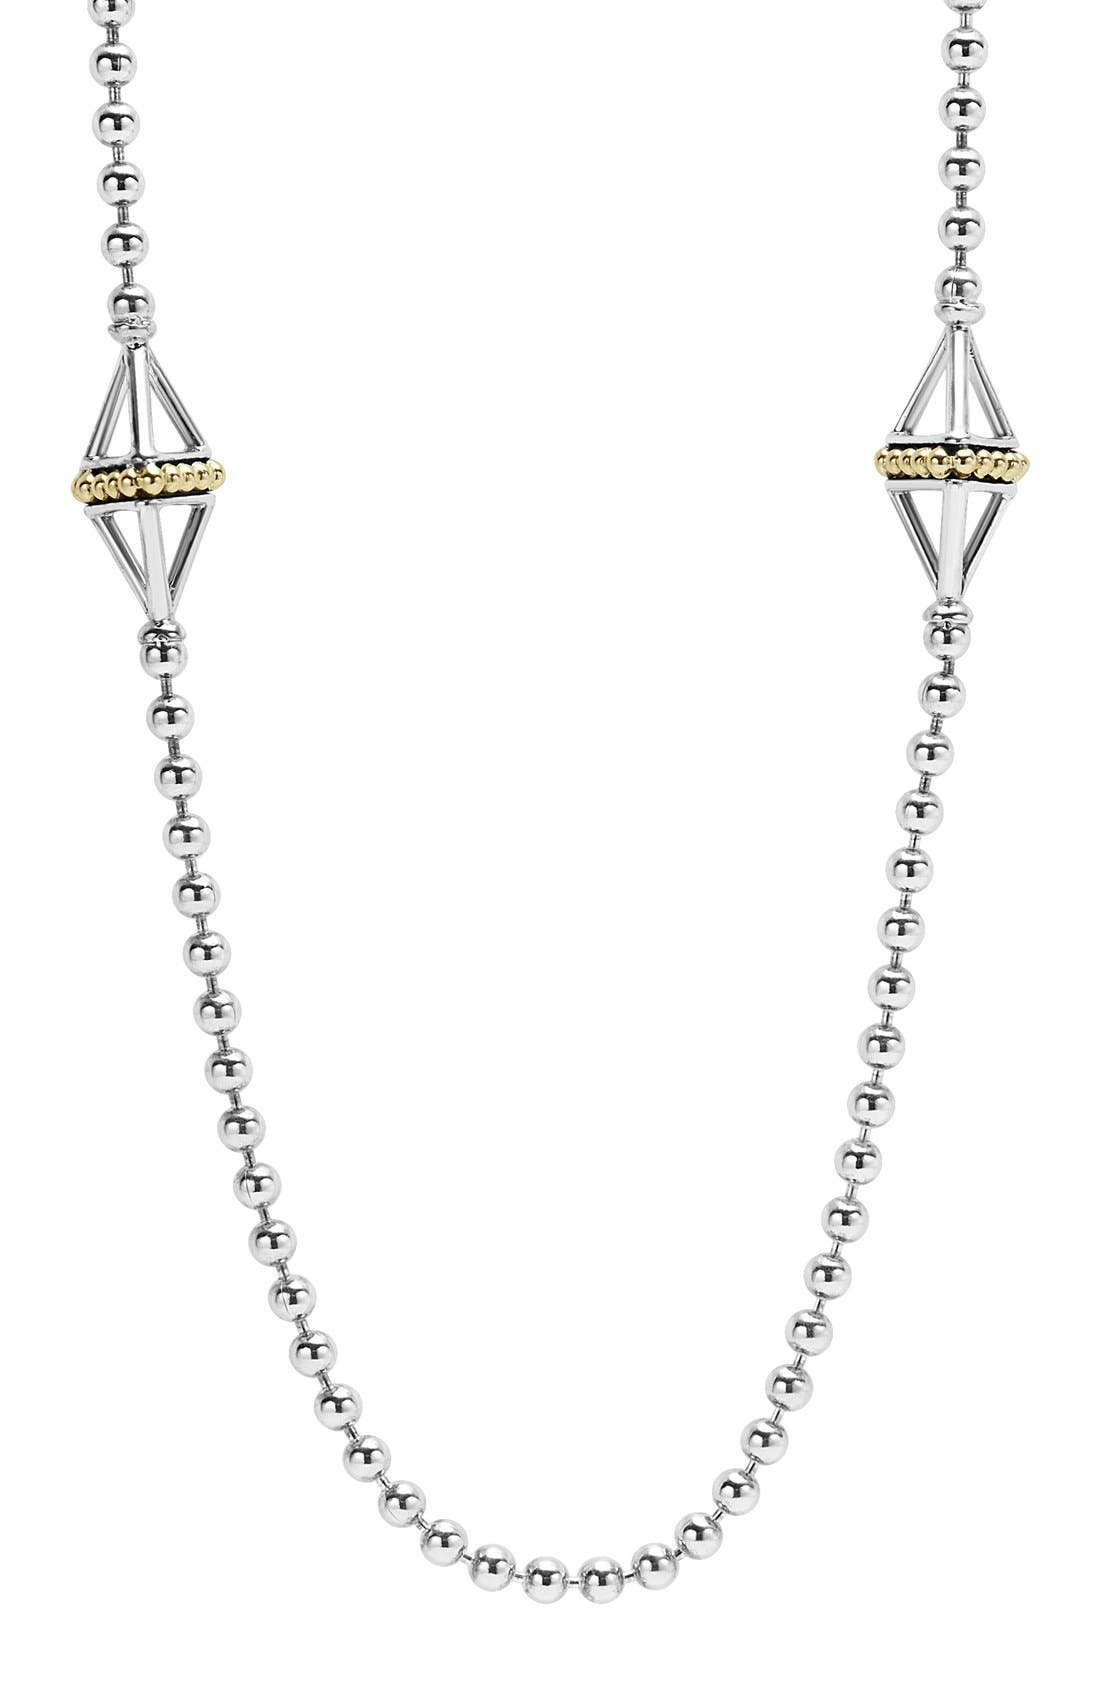 KSL Long Pyramid Station Necklace,                         Main,                         color, Silver/ Gold